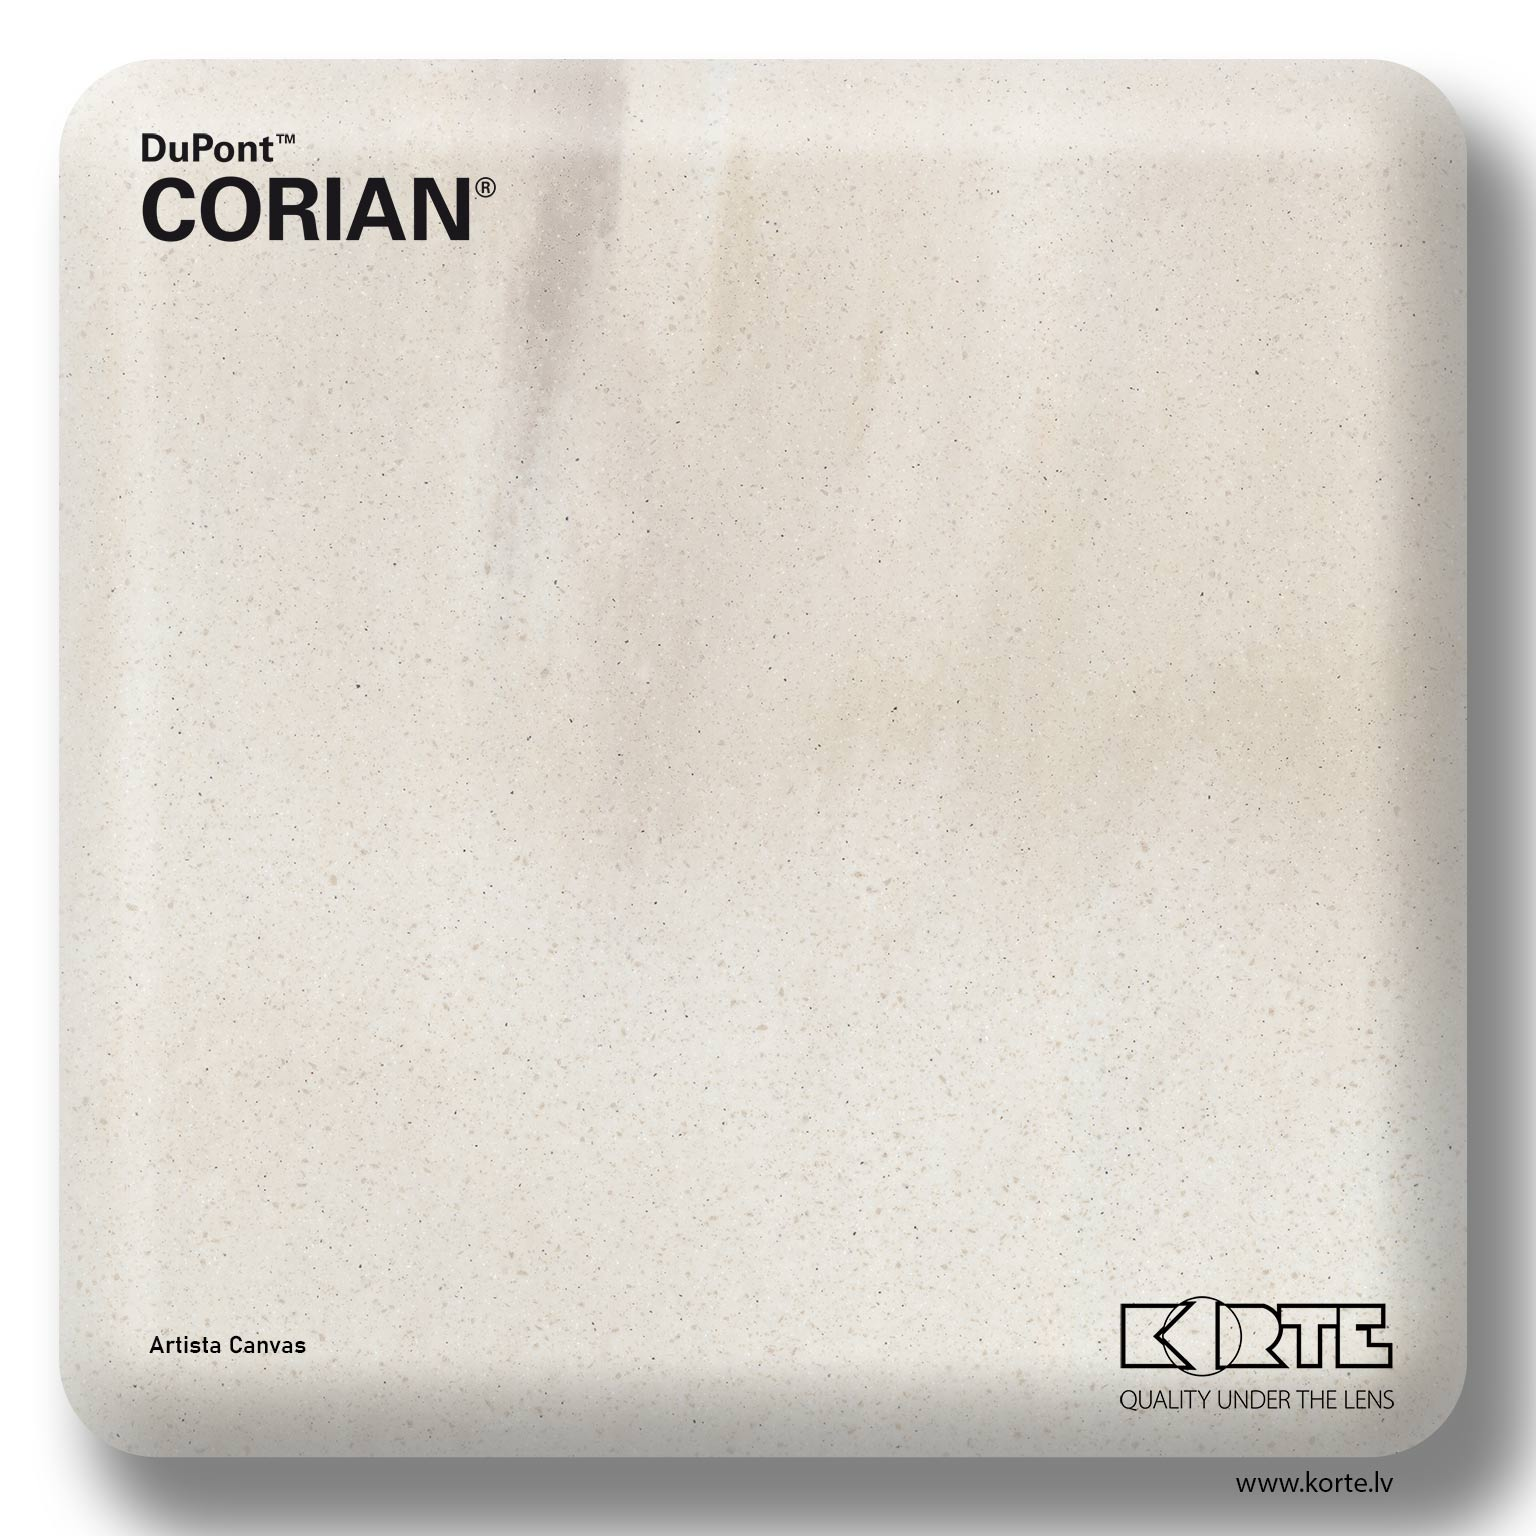 DuPont Corian Artista Canvas